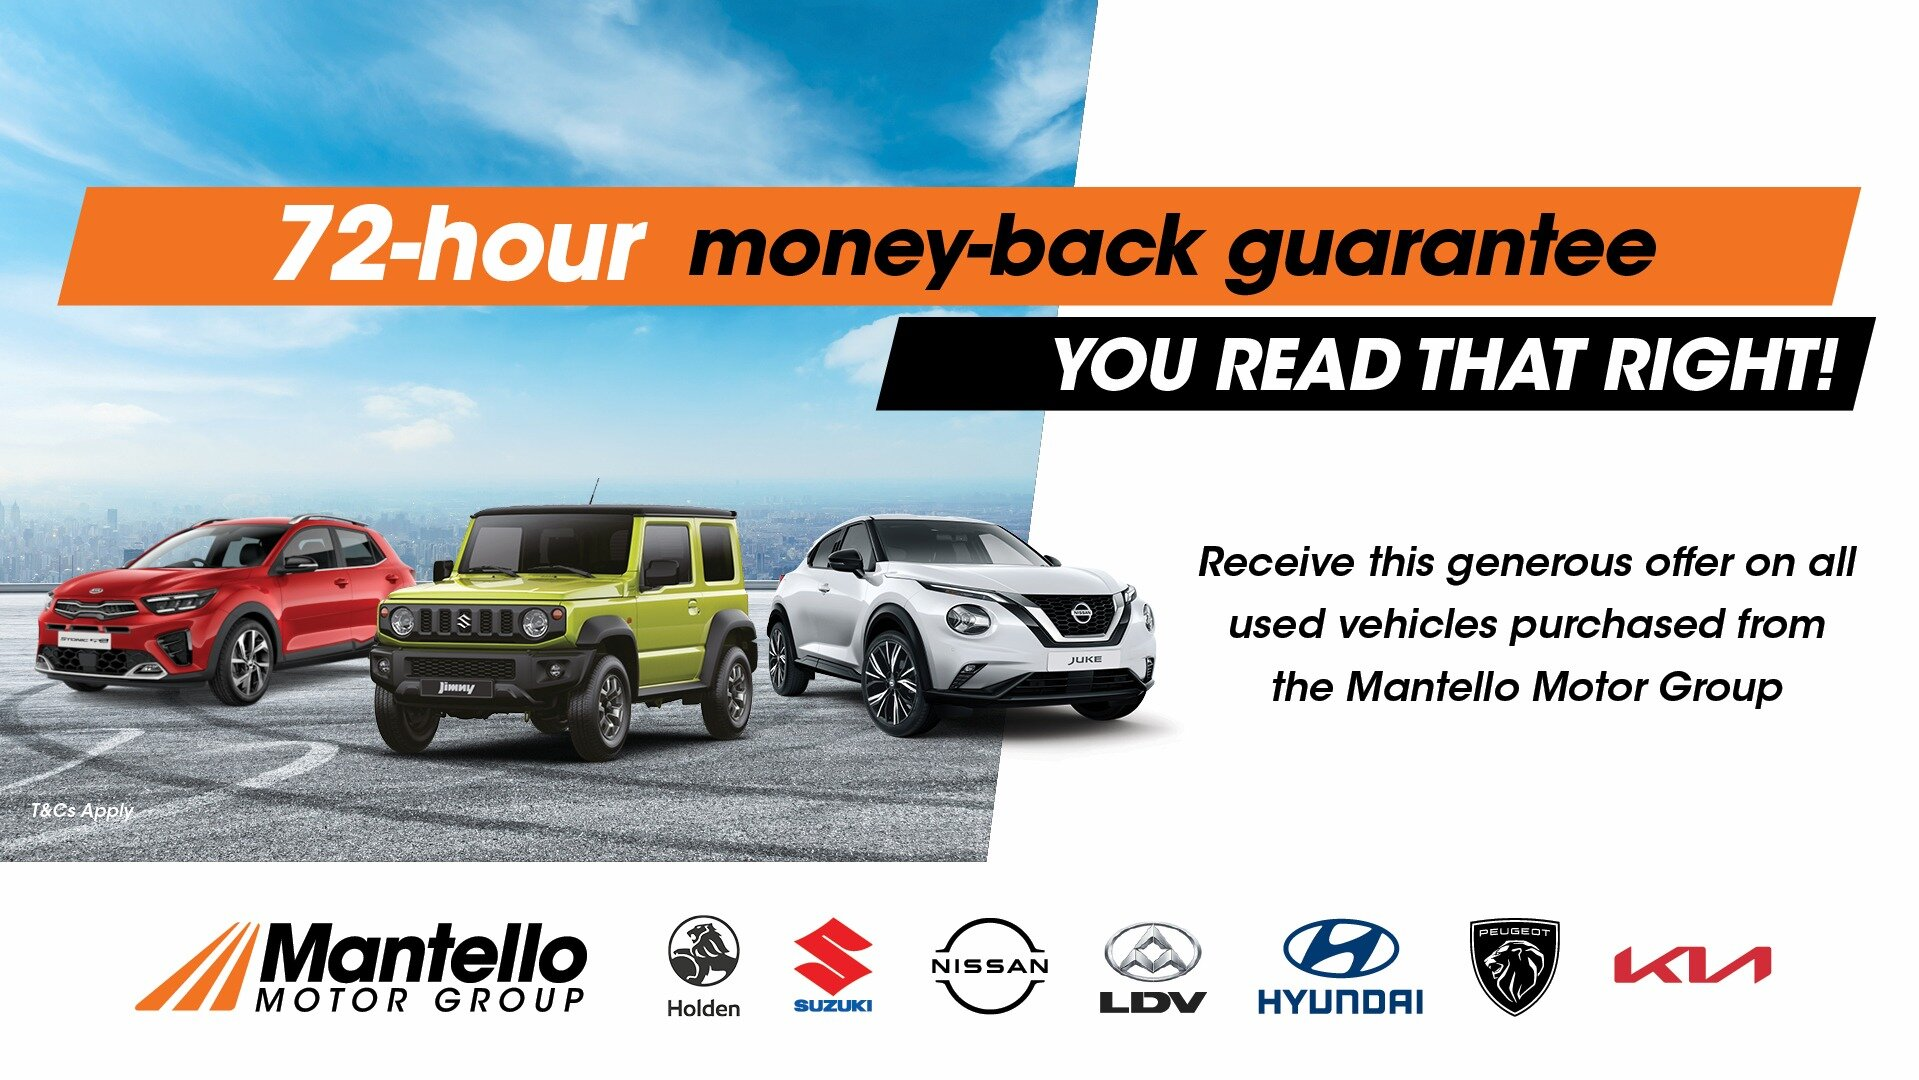 72 hour money back guarentee